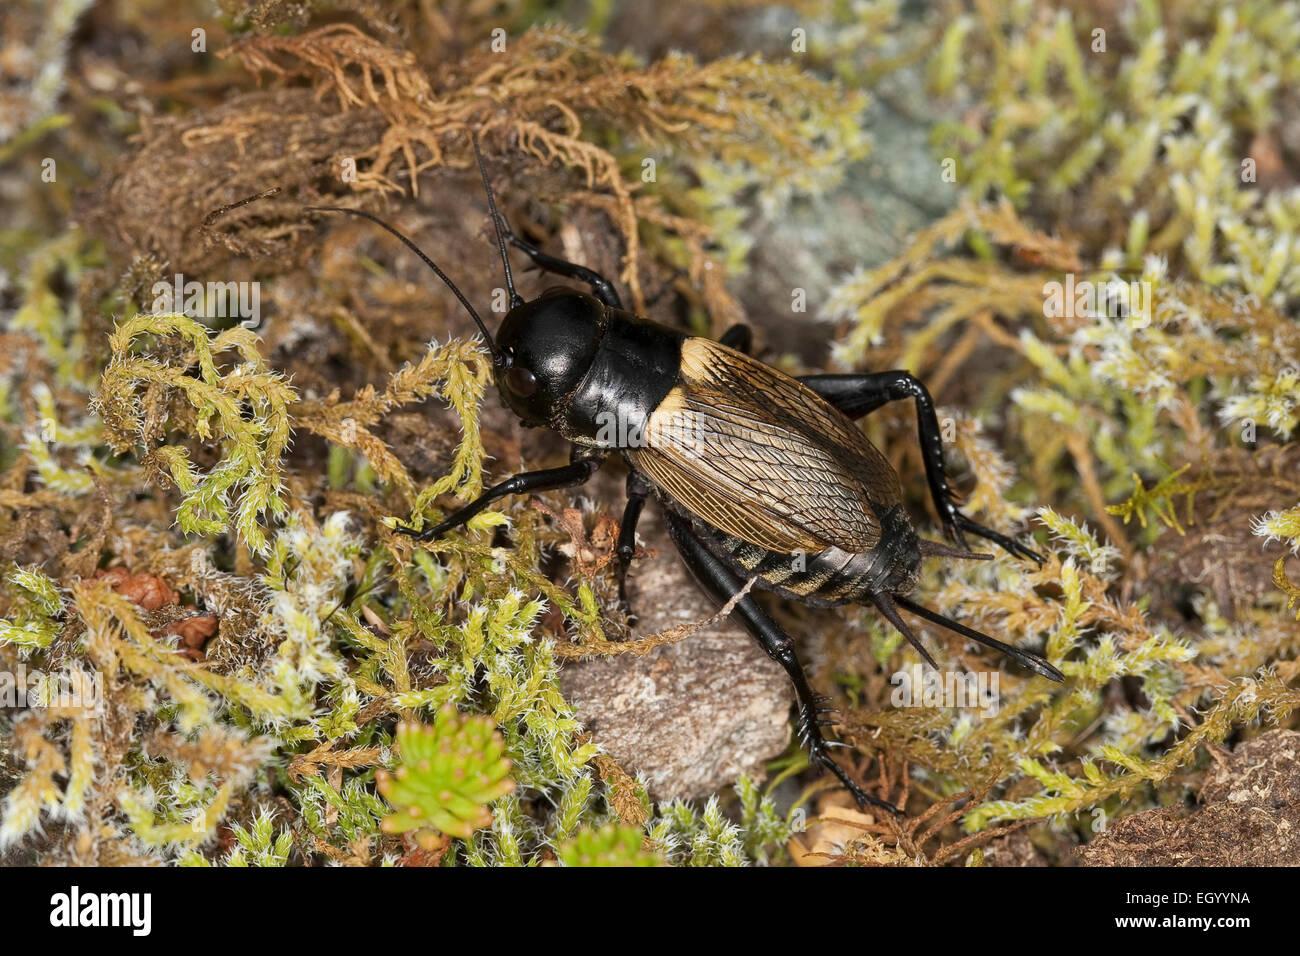 Campo cricket, femmina, Feldgrille, Weibchen, Feld-Grille, calandra, Gryllus campestris, Grillen, Gryllidae, Grillon Immagini Stock